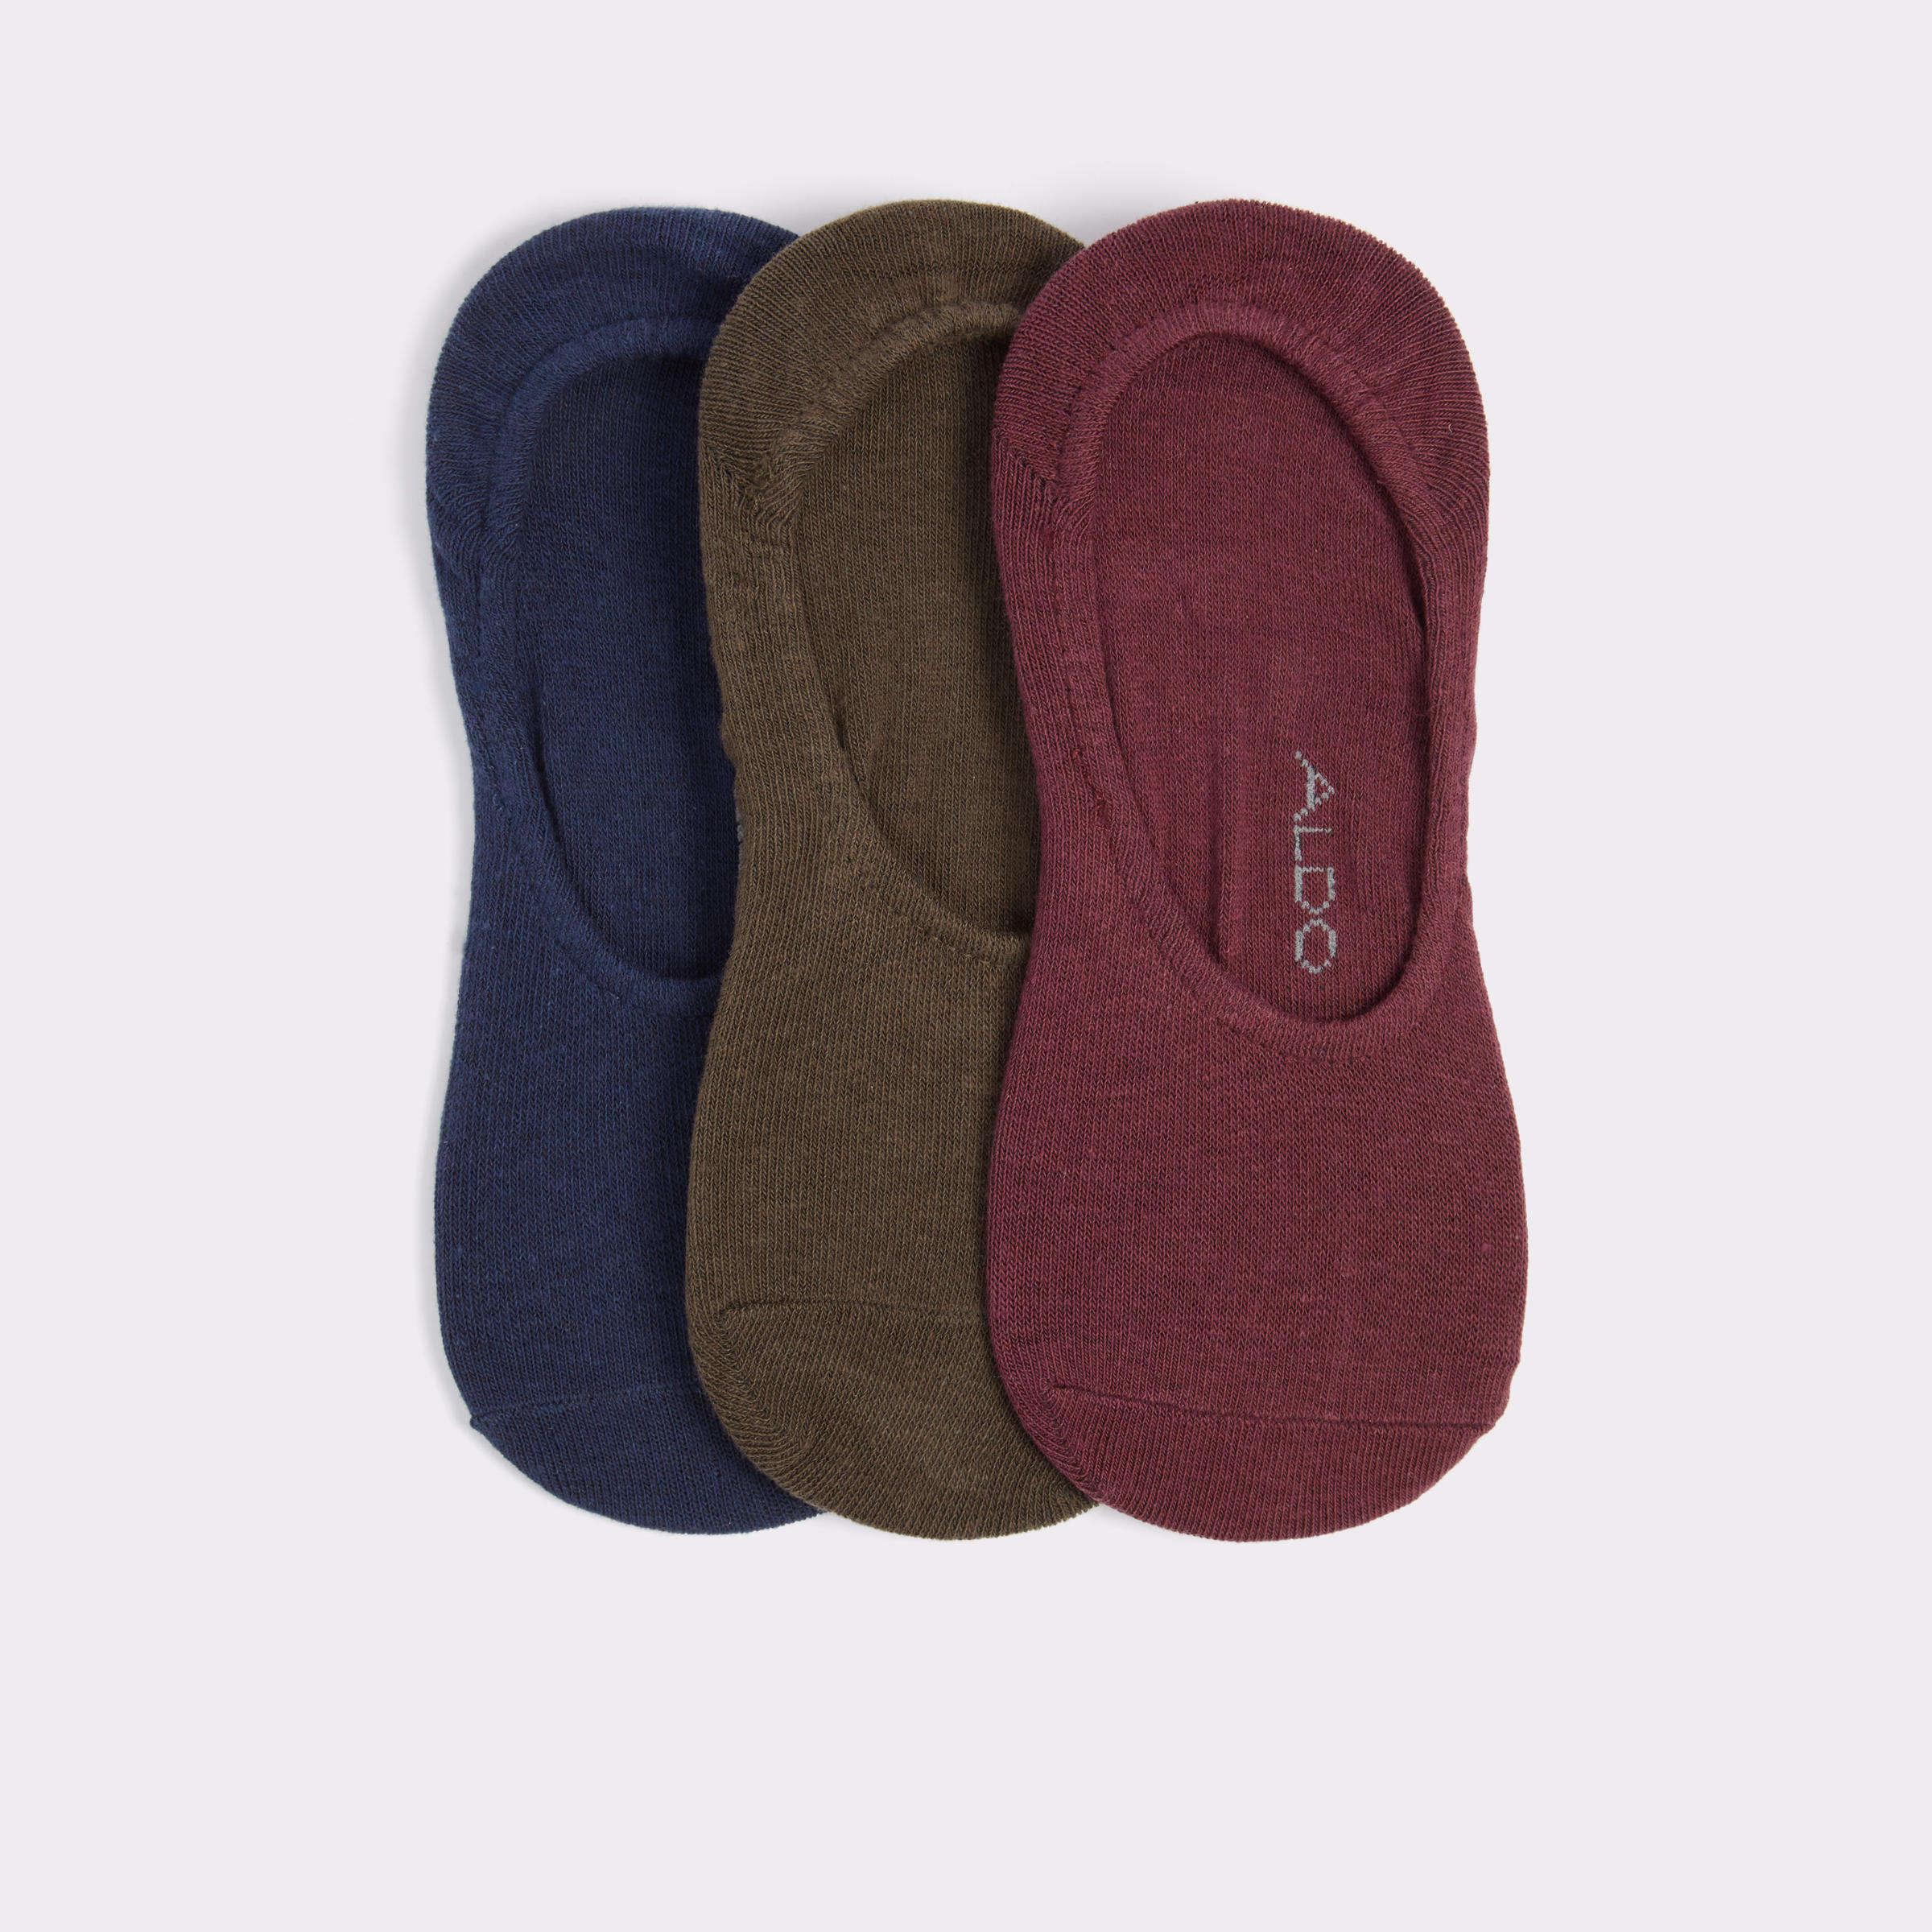 Sosete bleumarin, pentru barbati, ALDO - Foren2, din material textil